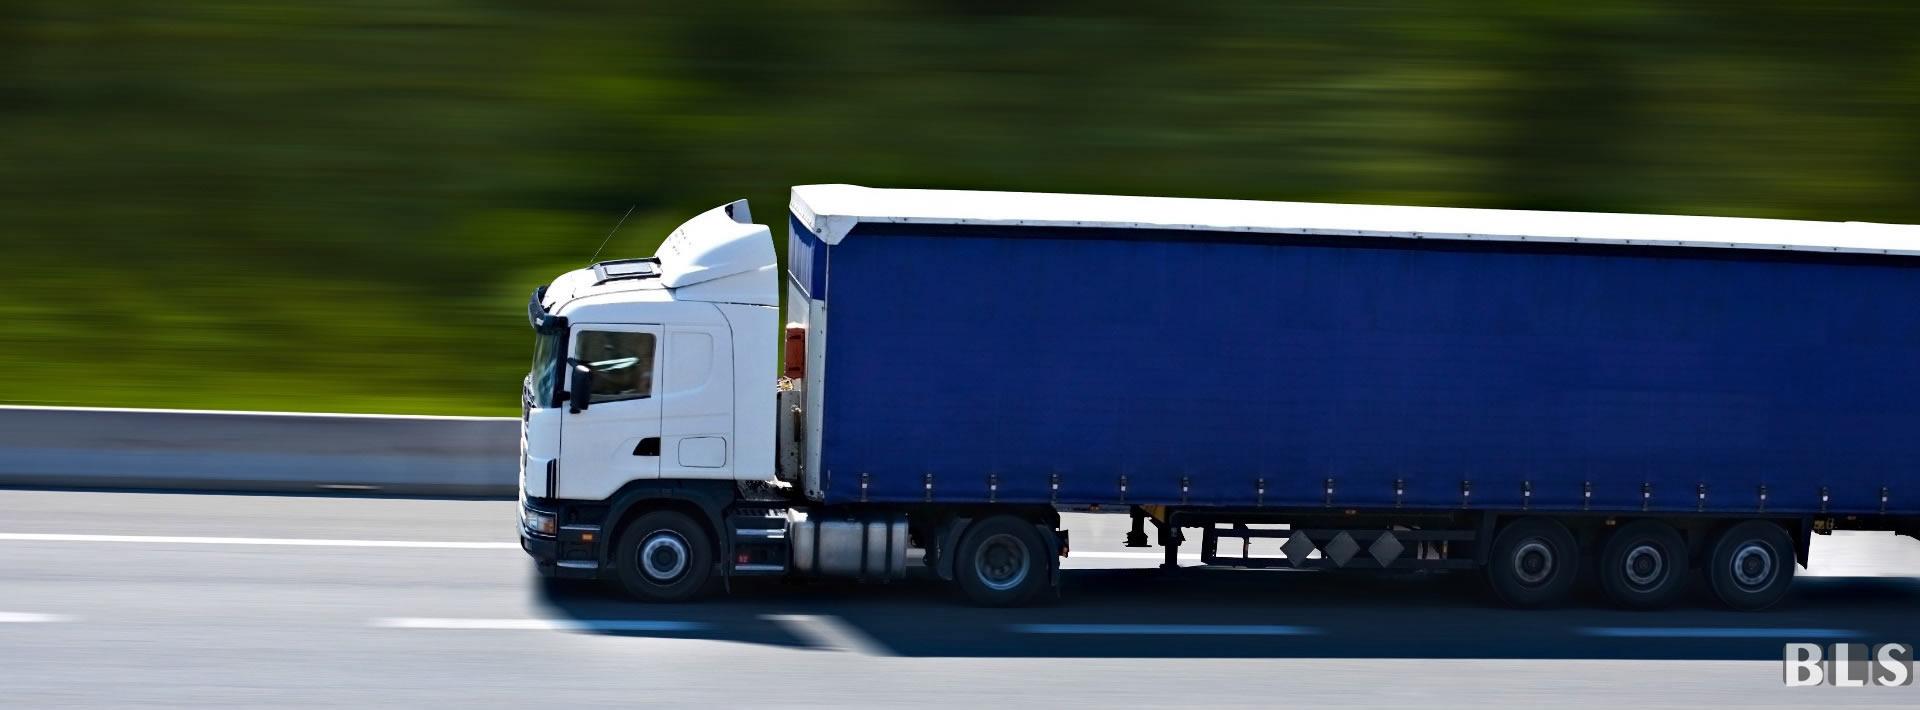 Best Logistics Solution